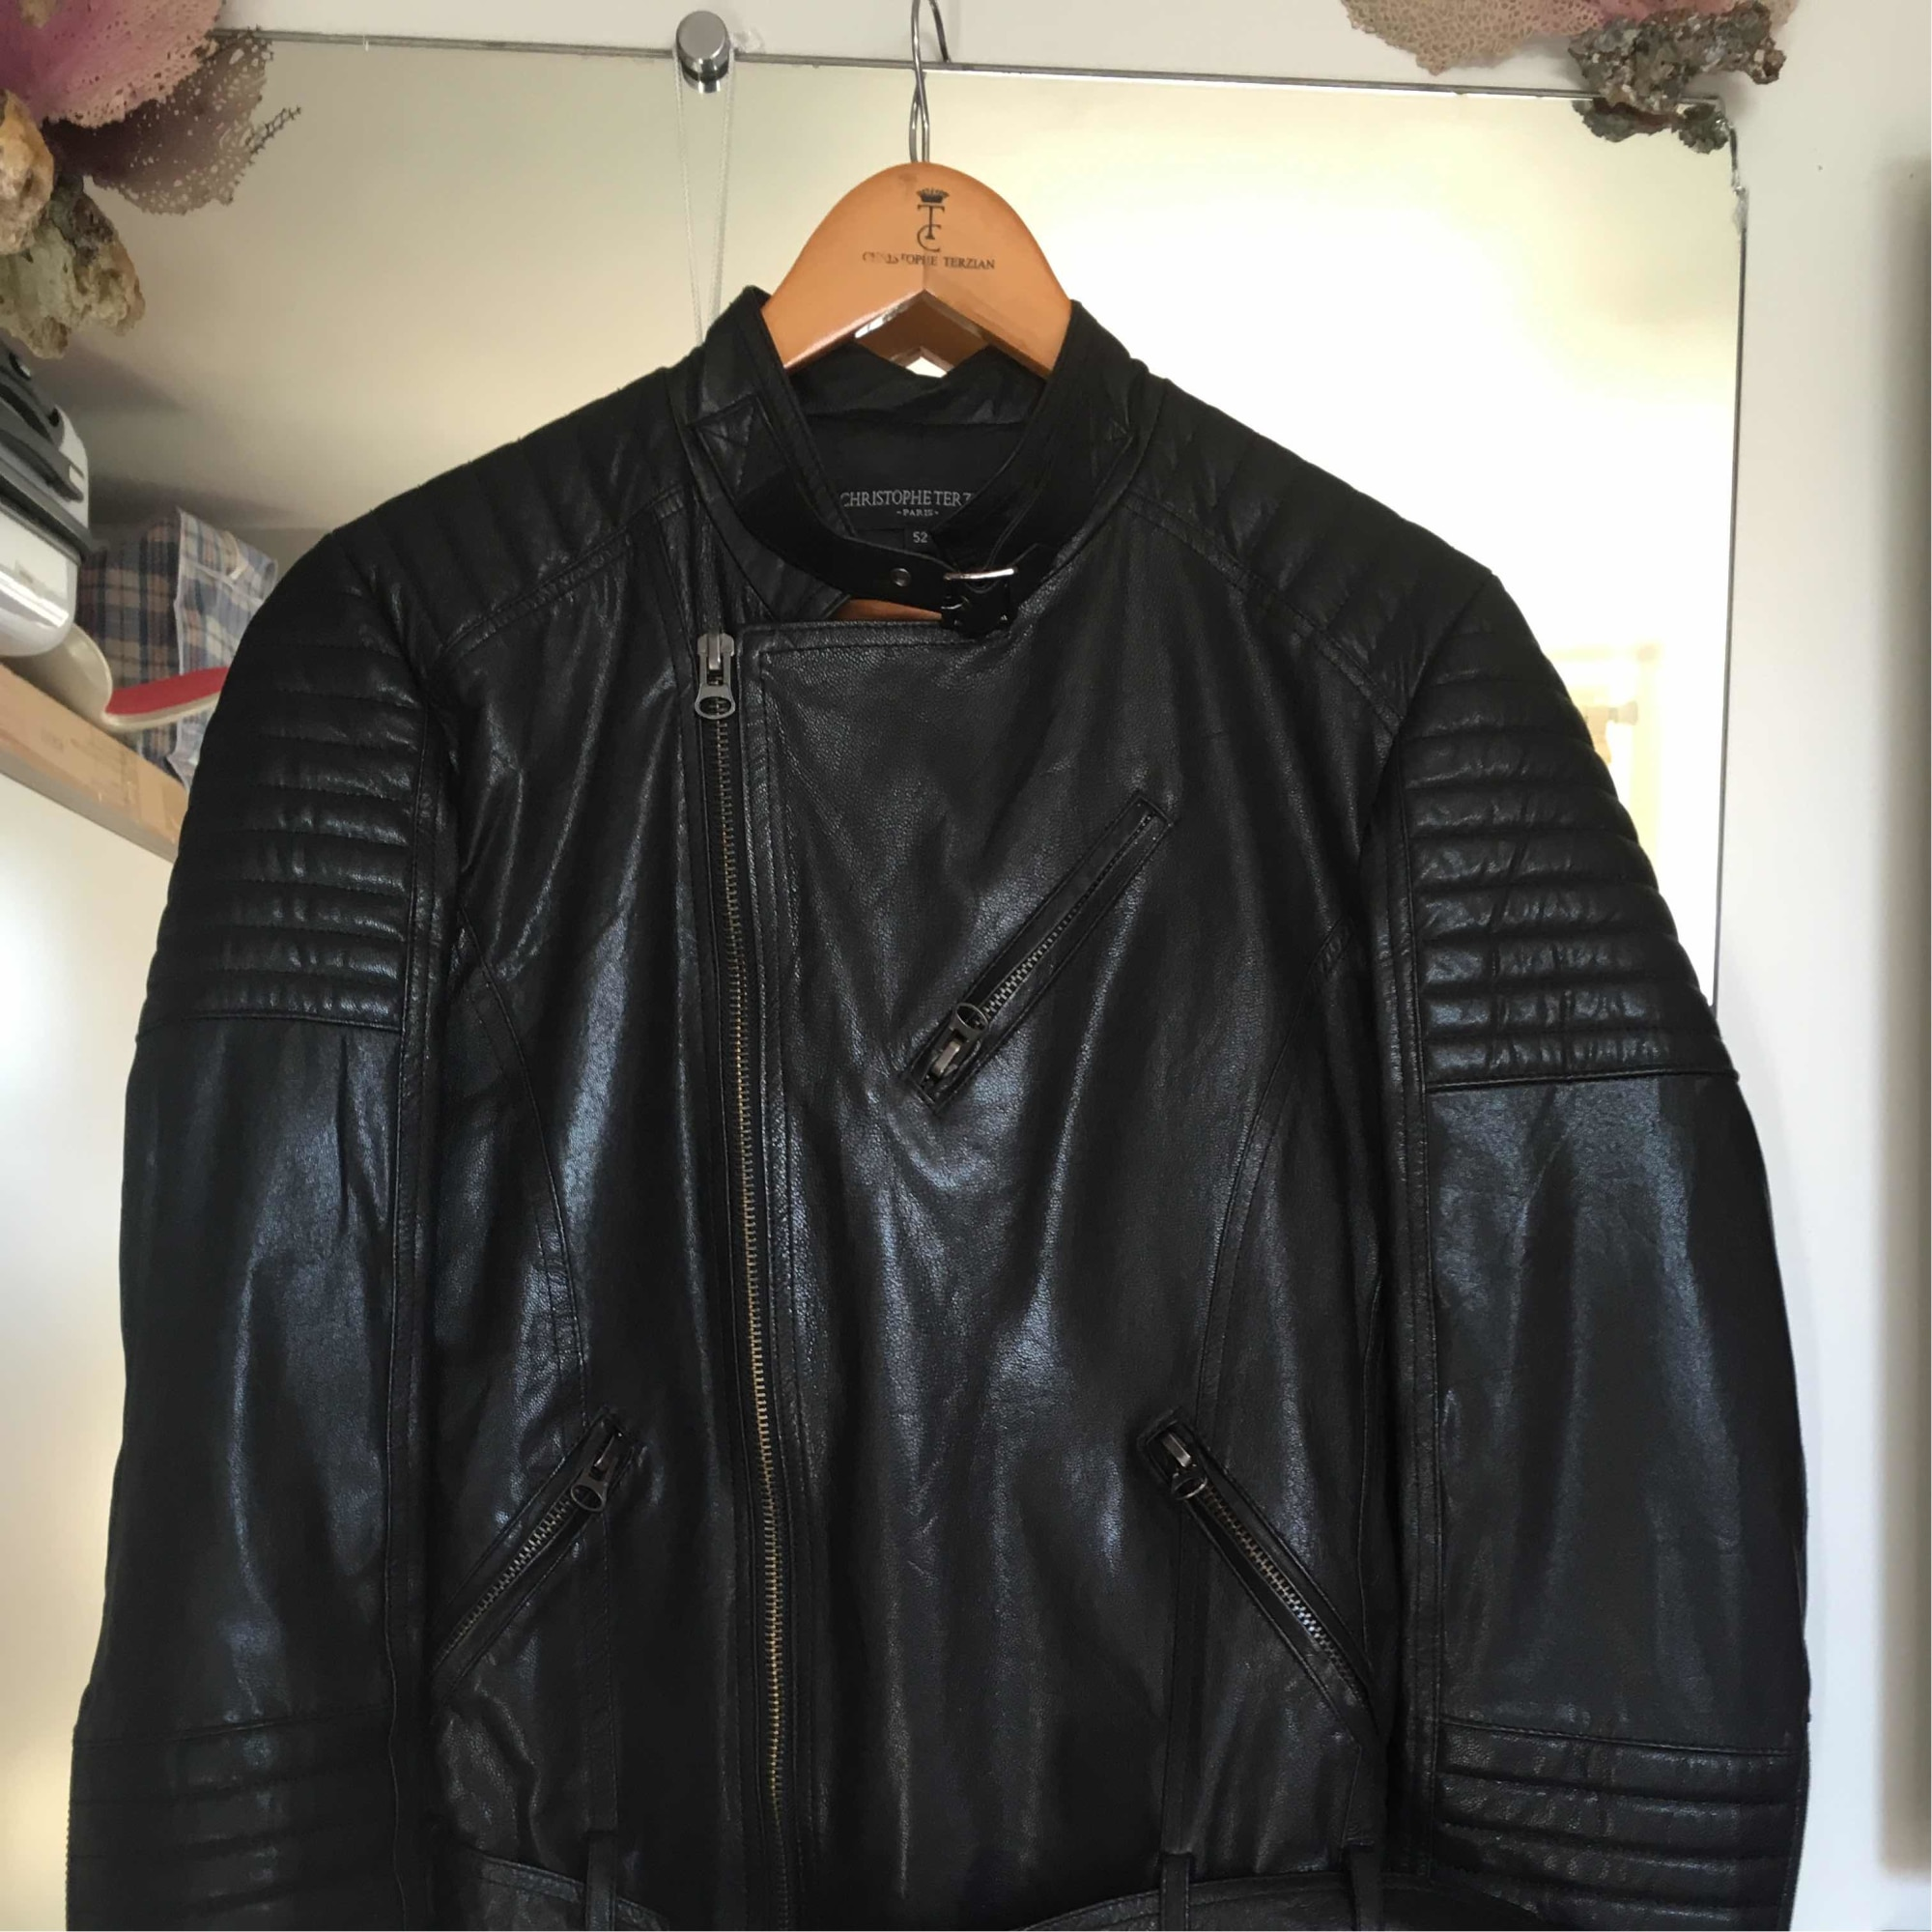 Blouson en cuir MARQUE INCONNUE 52 (L) noir - 5286690 43b718130a68